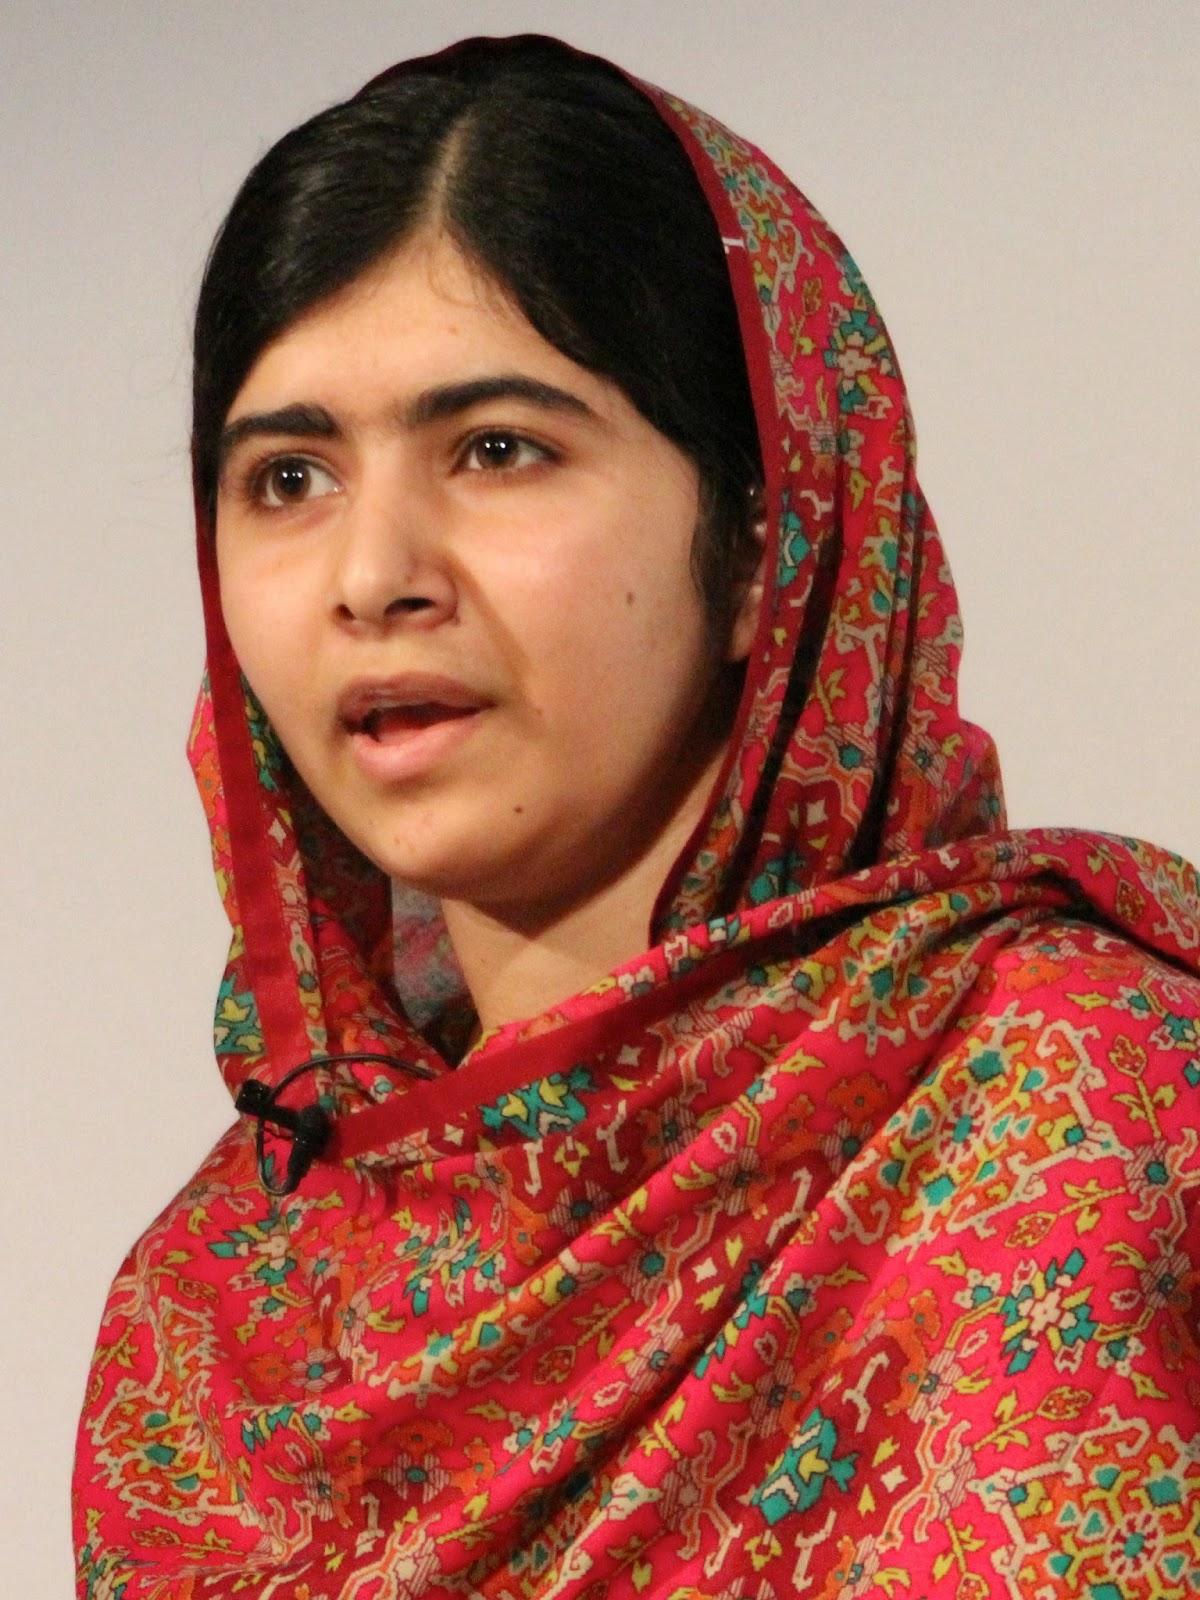 Malala Yousafzai Luxe Models